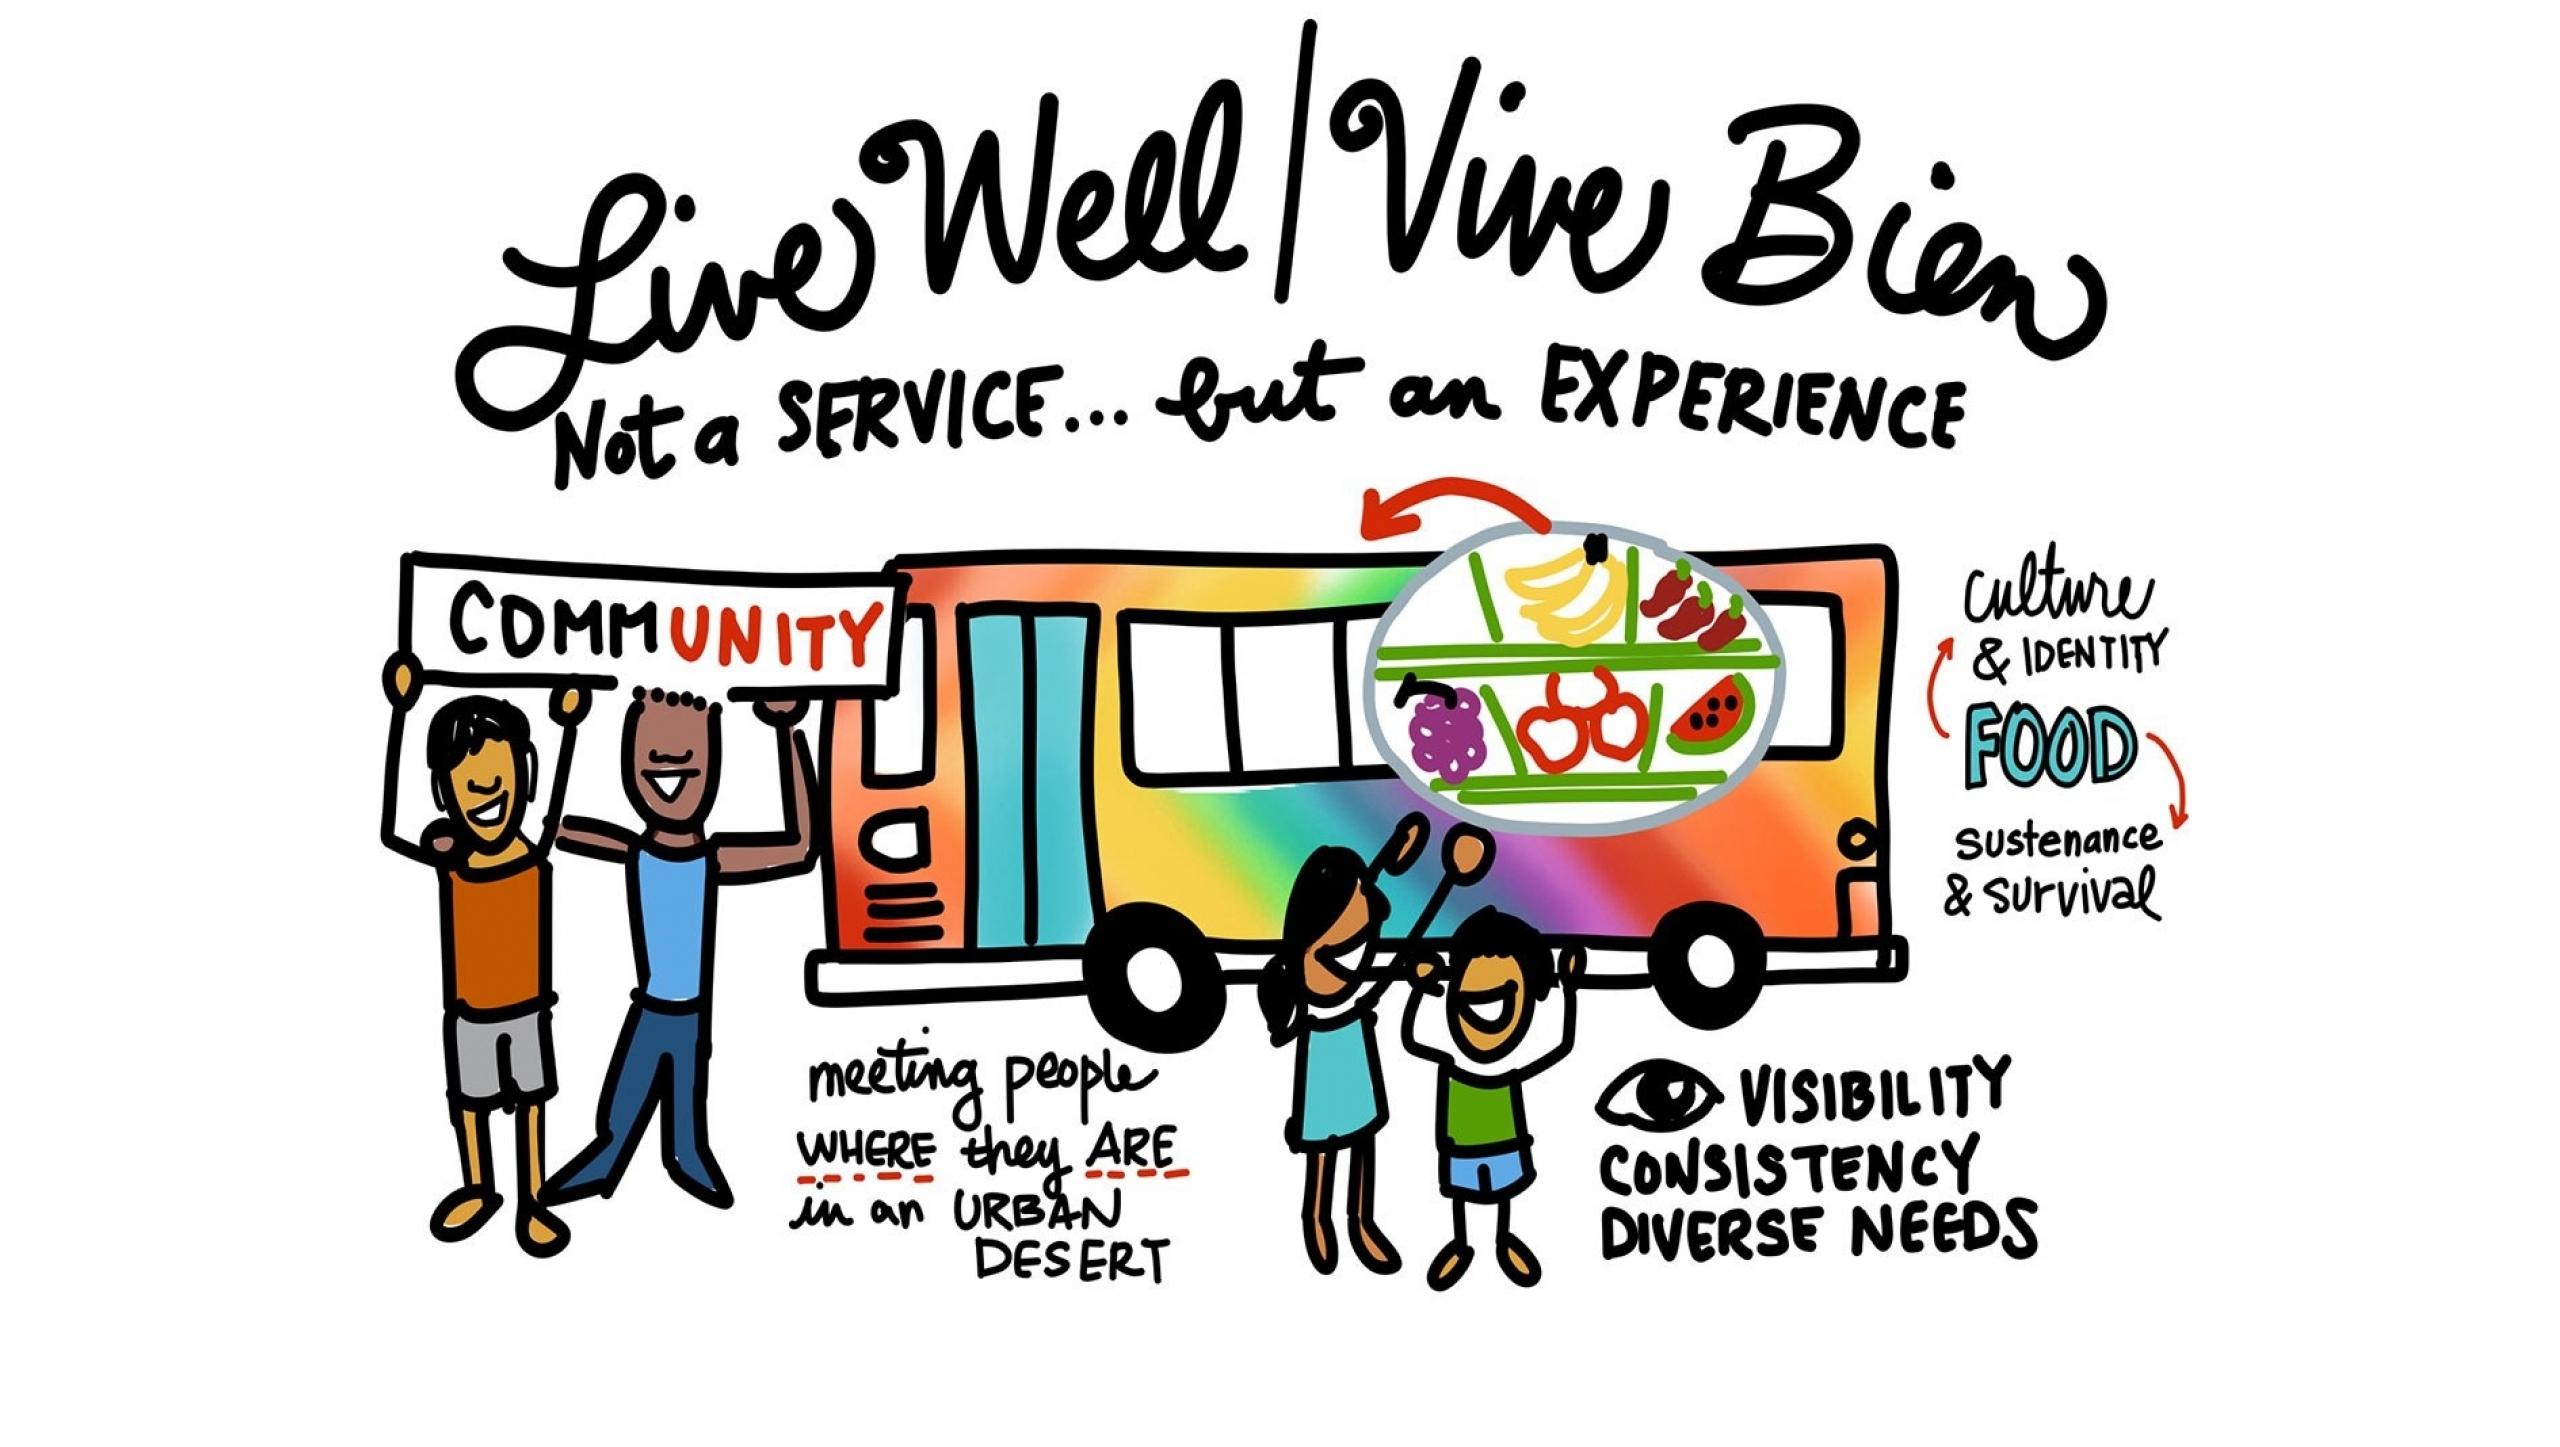 Illustration of Live Well/Vive Bien initiative.